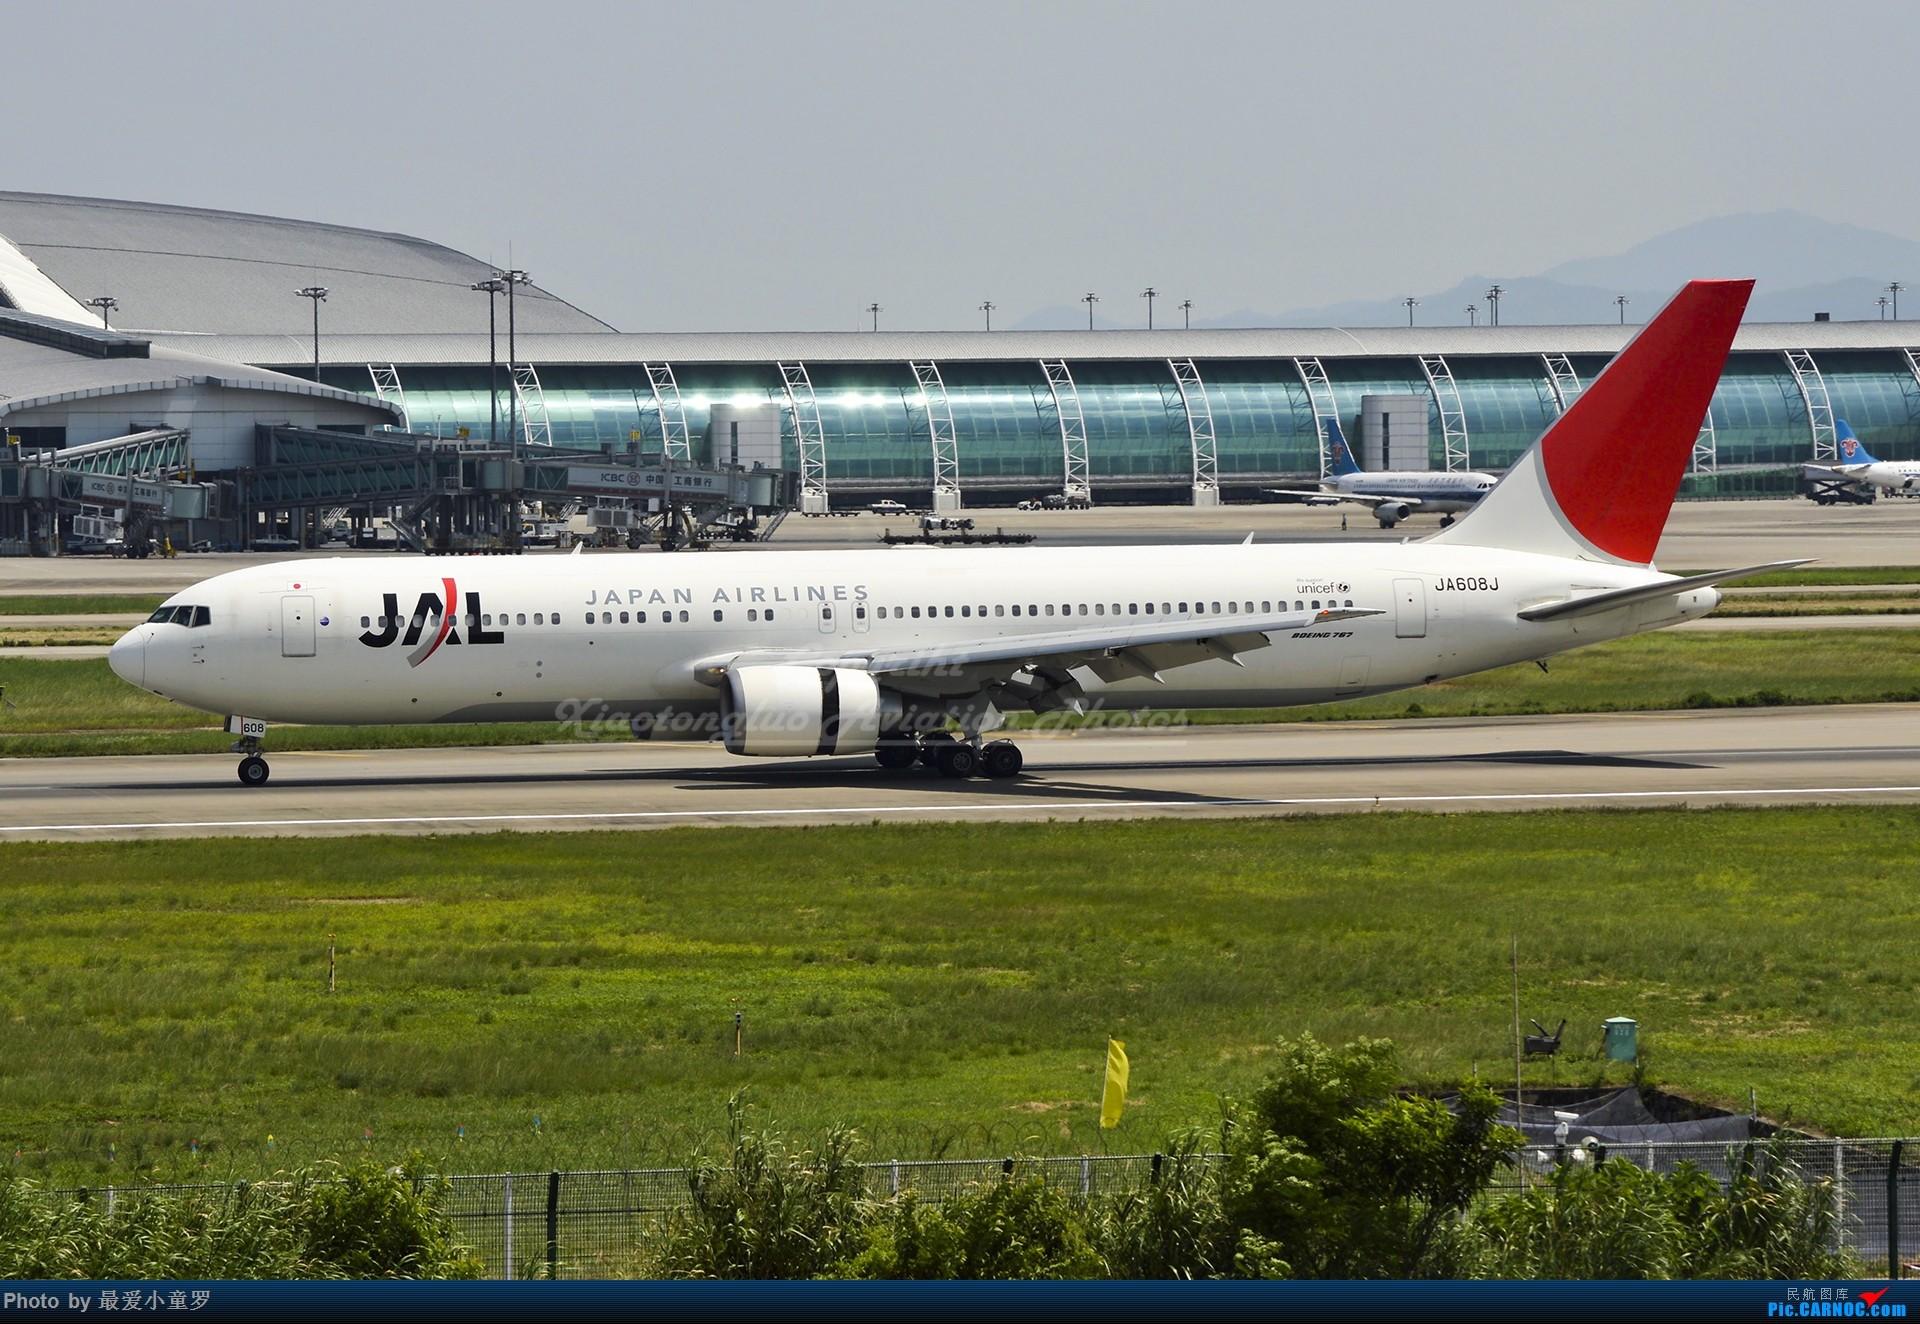 Re:[原创]2013-2018,系列组图纪念拍机5周年 BOEING 767-300ER JA608J 中国广州白云国际机场